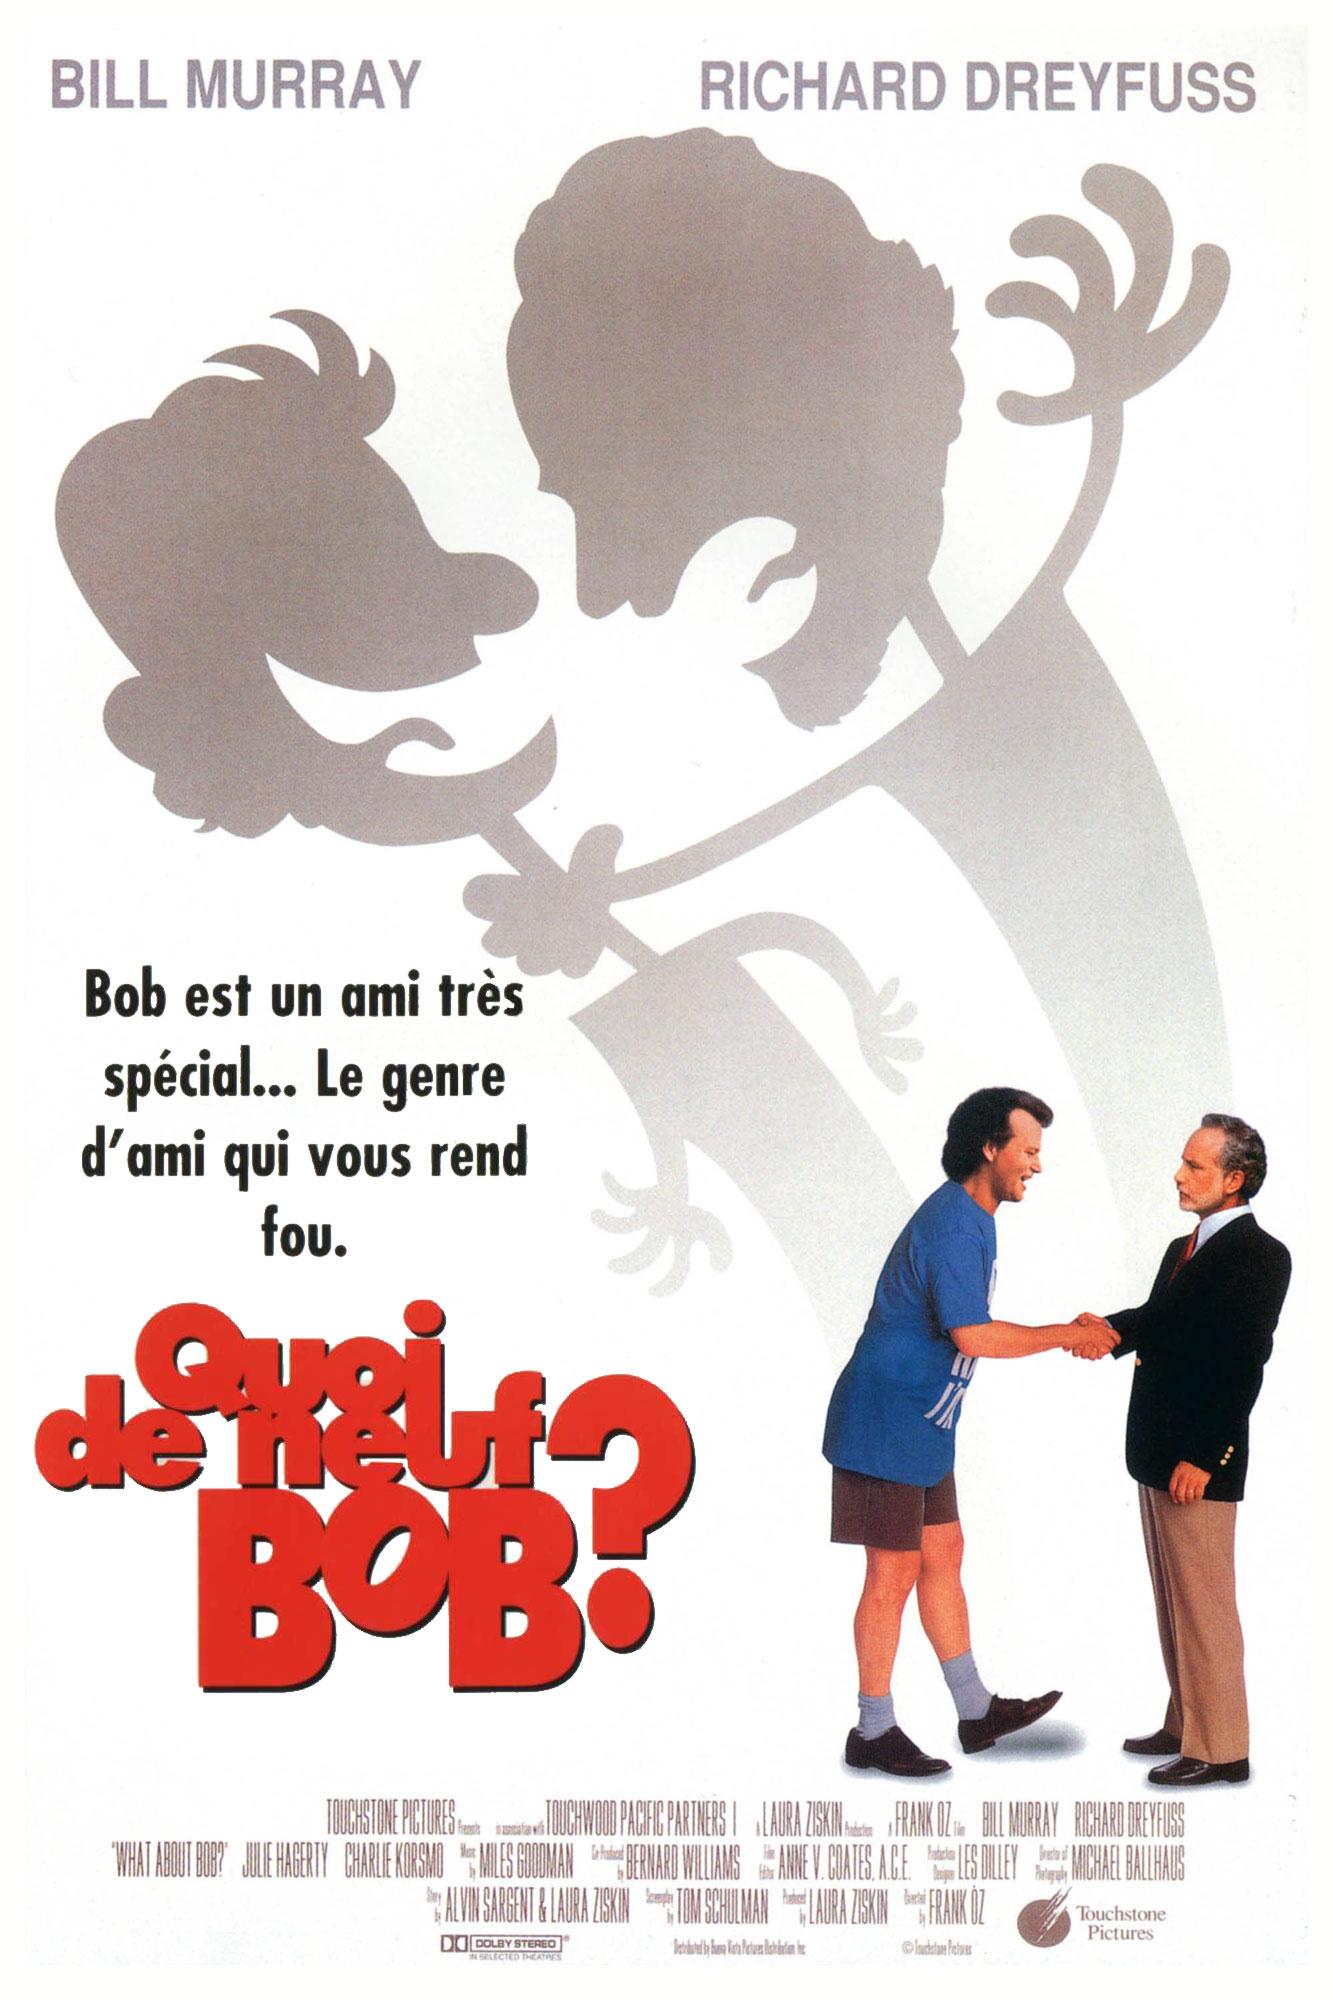 Quoi de neuf bob ? affiche poster disney touchstone